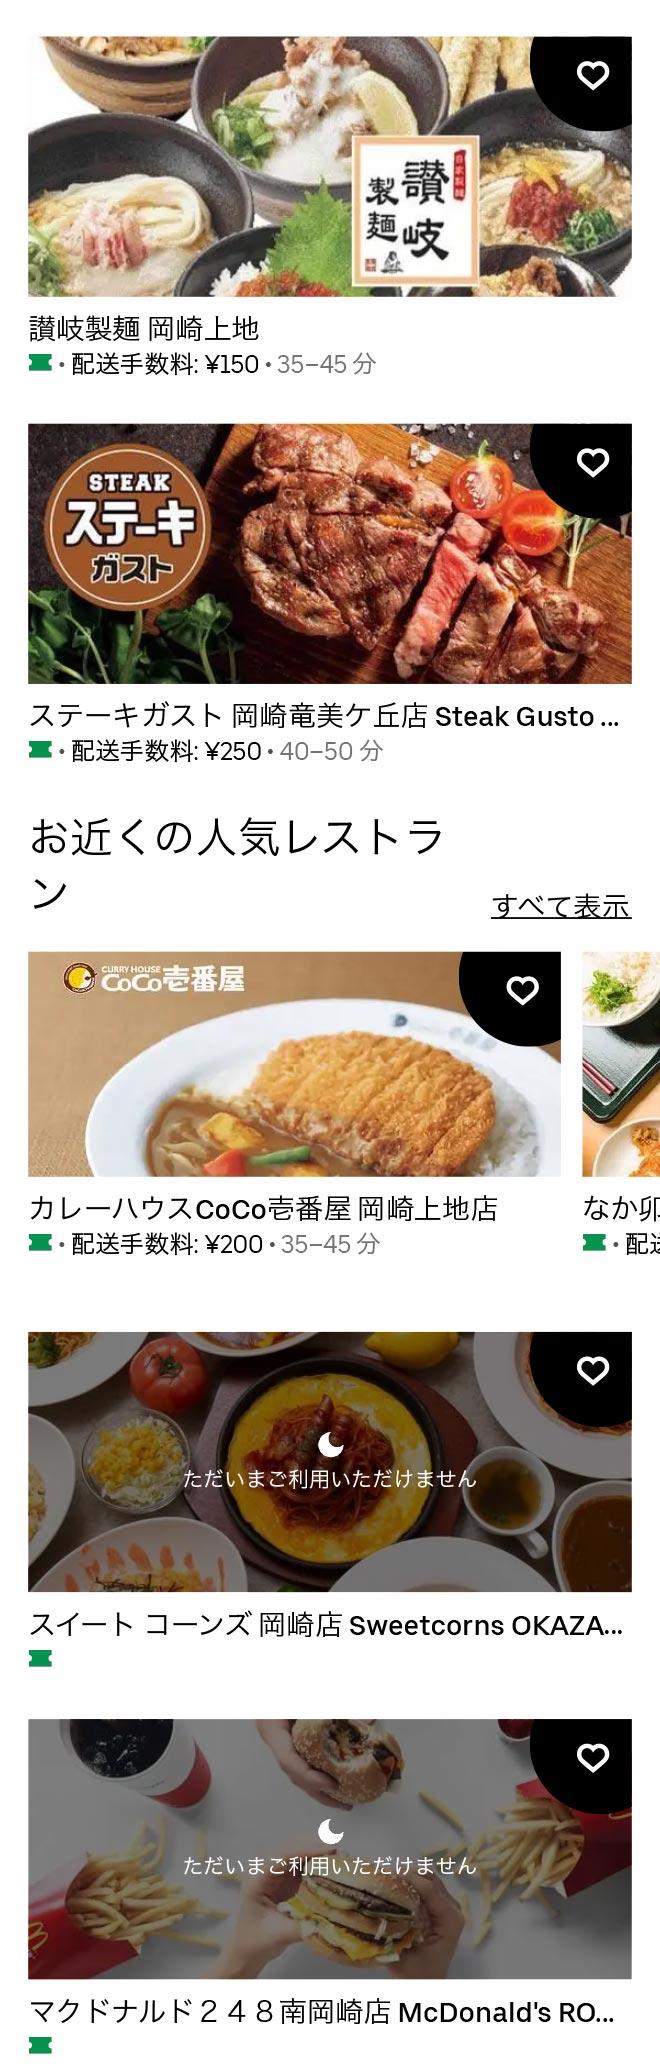 U okazaki 2106 04